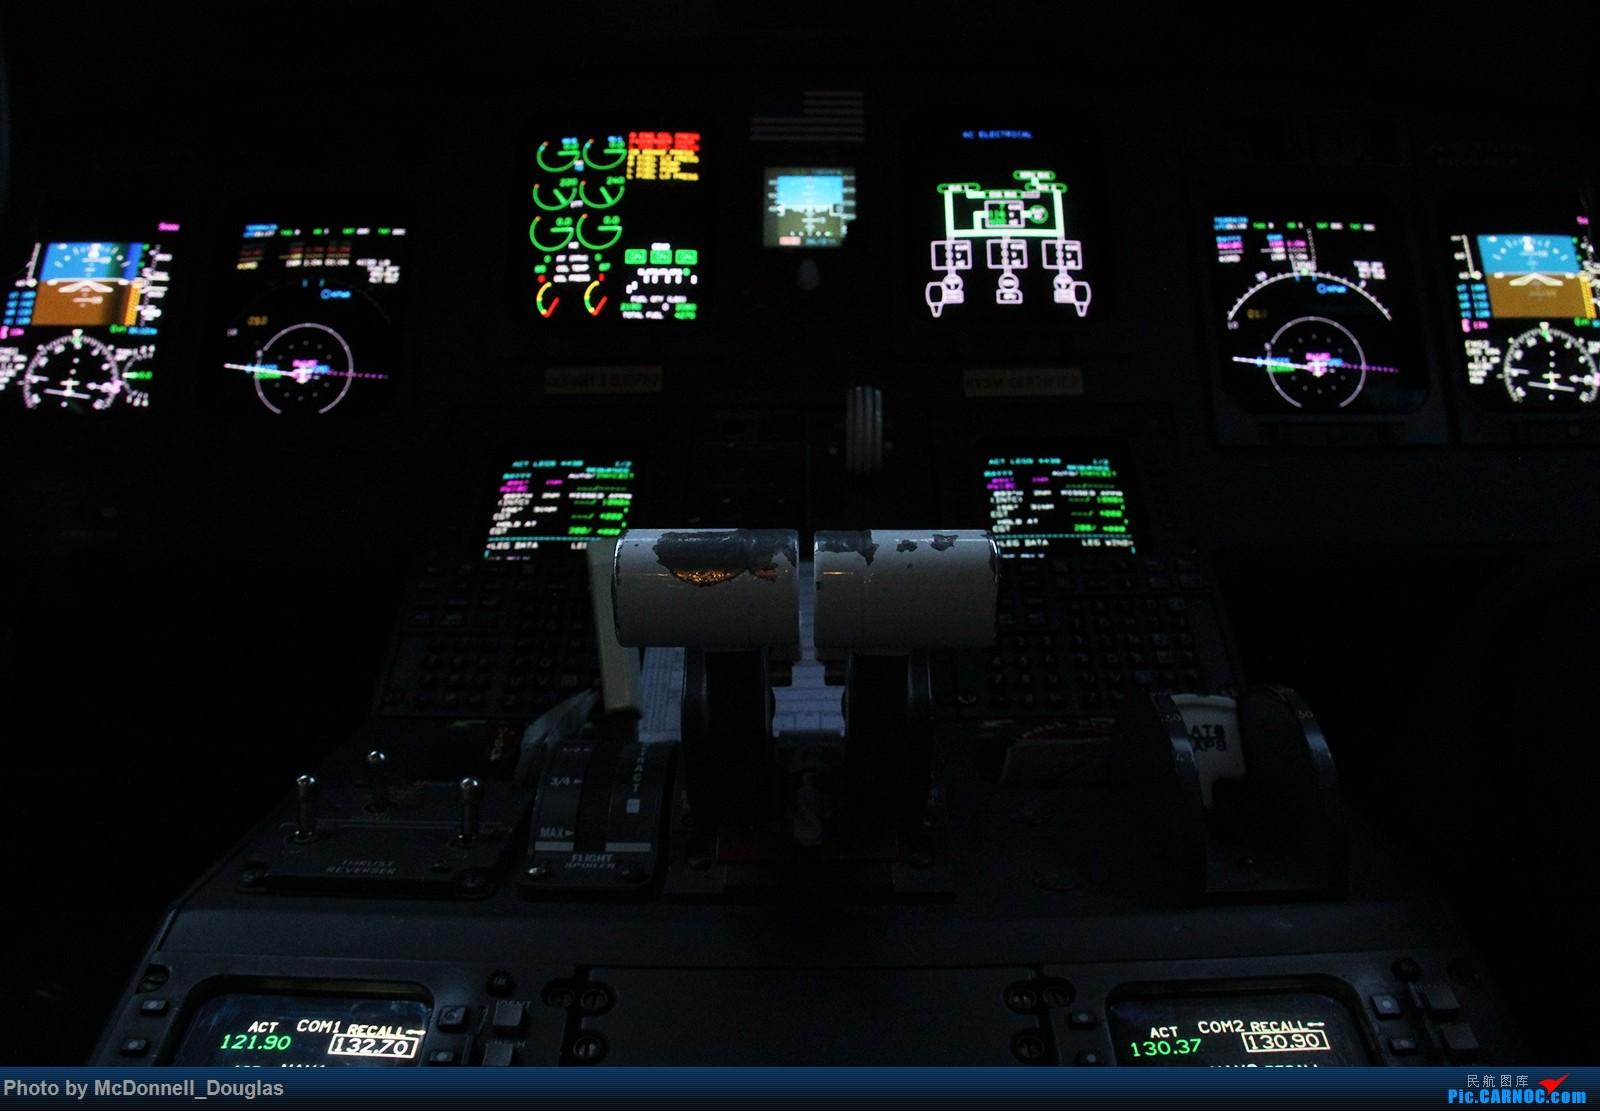 Re:[原创]【上海飞友会】图会很多,也有很多驾驶舱,杂七杂八的美帝,梦寐以求的圣马丁,这更绝不弃贴【驾驶舱已出现】 CANADAIR CL-602-2D24 REGIONAL JET CRJ-900LR N554CA 美国芝加哥奥黑尔国际机场